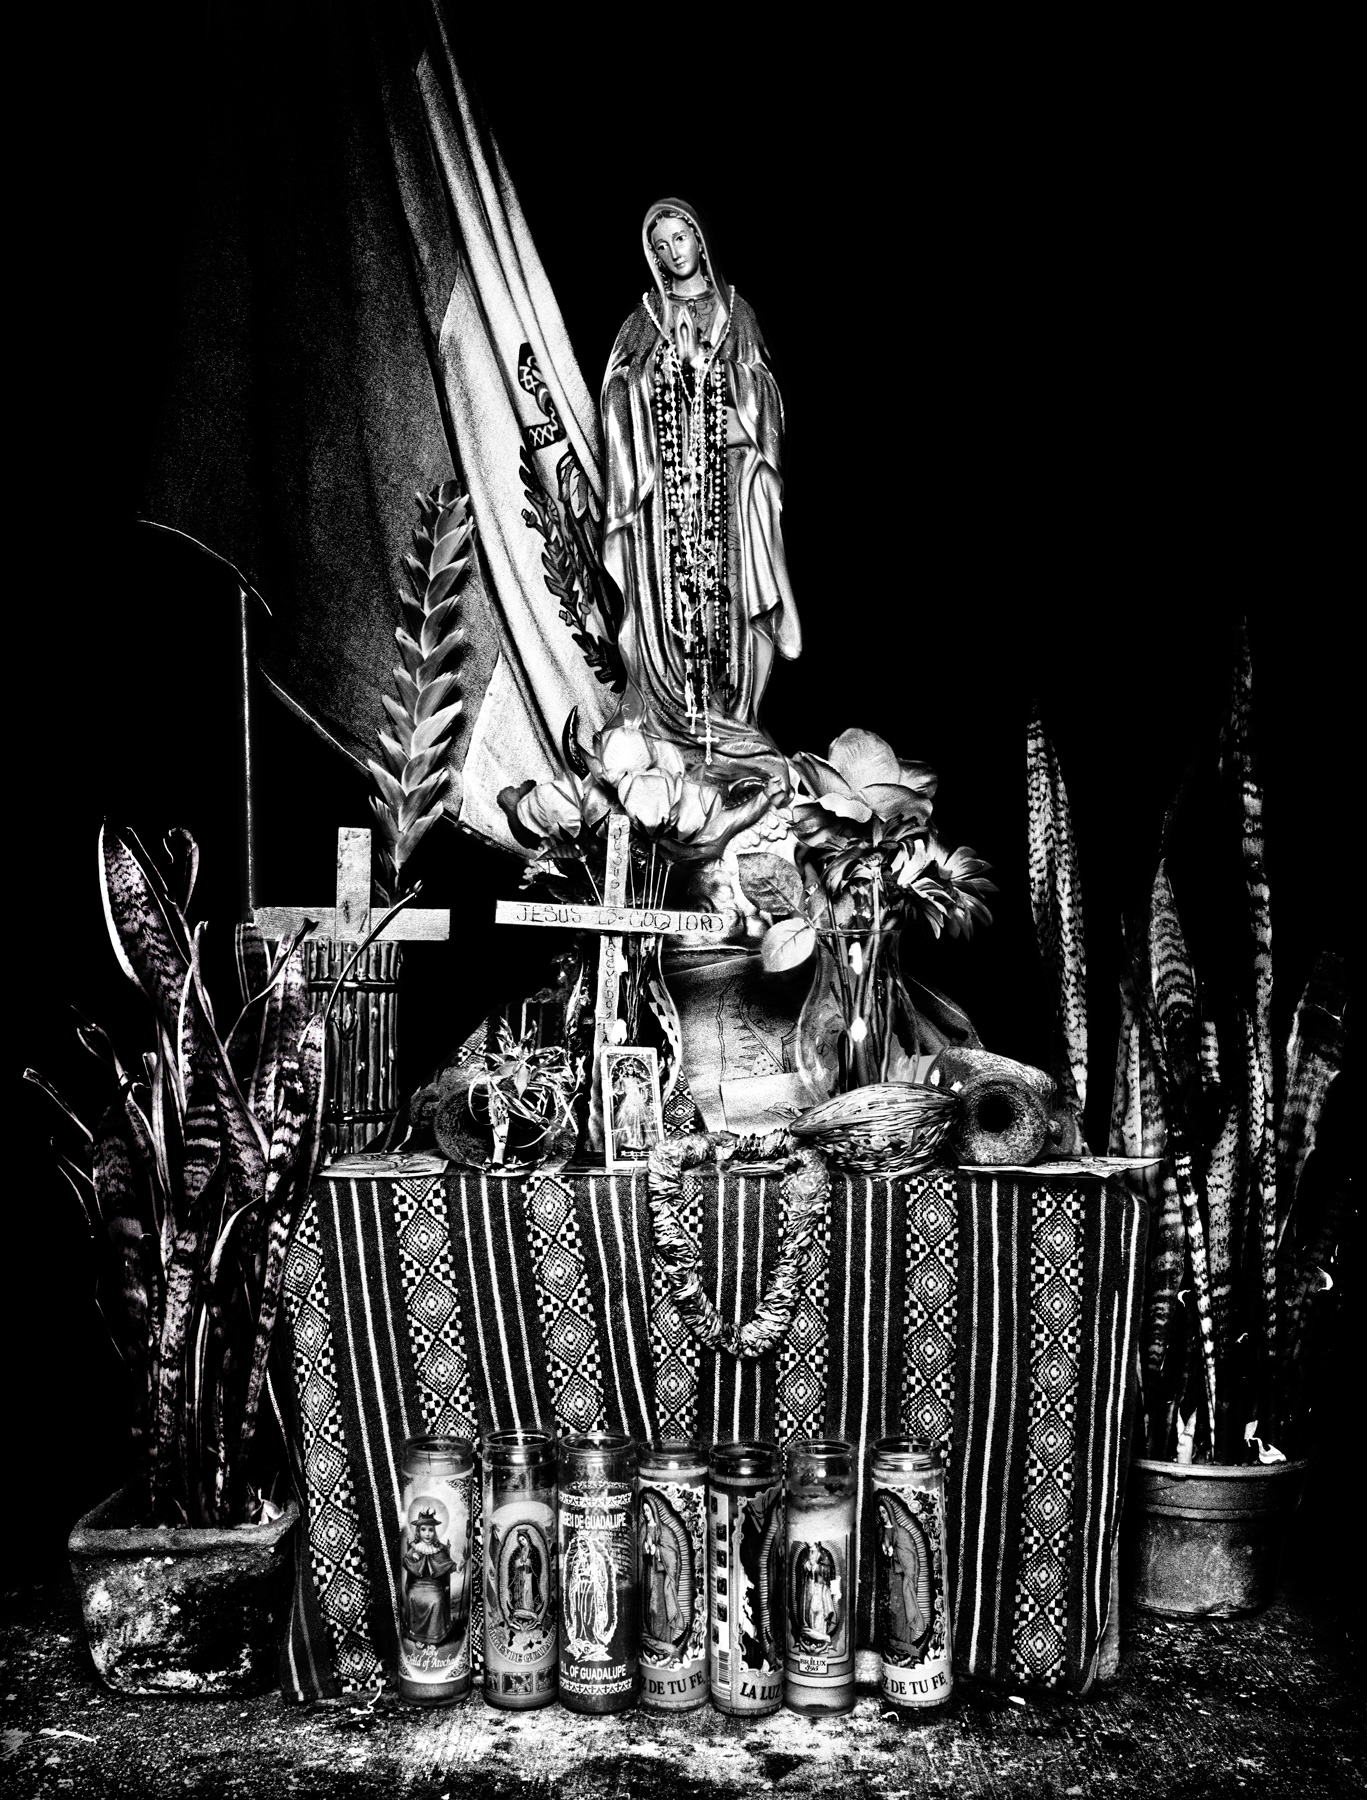 A shrine to the Virgin Mary at the Casa del Migrante, a migrant shelter in Tijuana, Mexico.